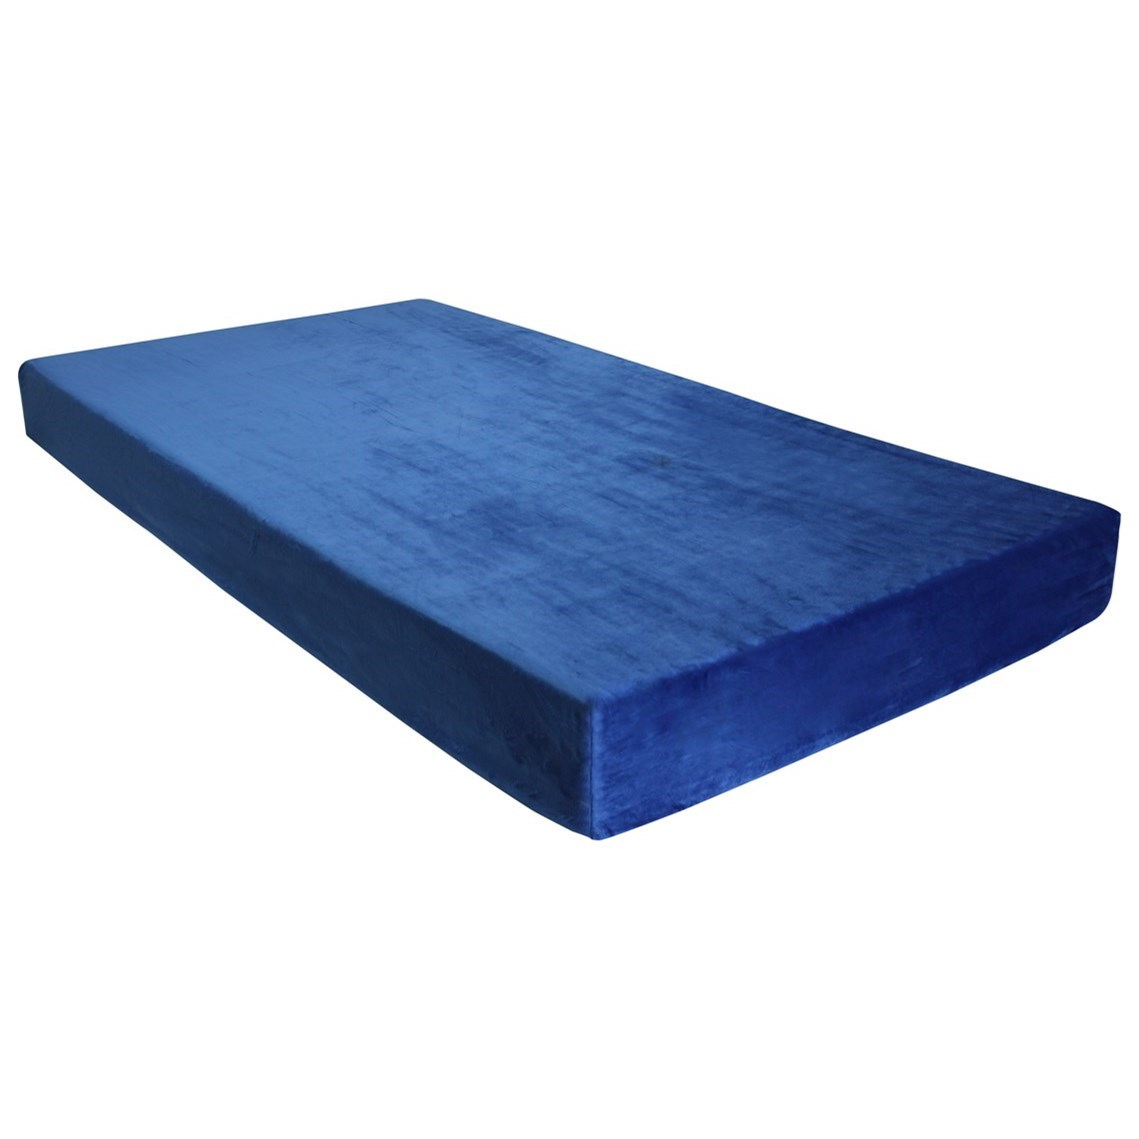 twin size mat mats pin foam inch mattress thick memory folding bed guest